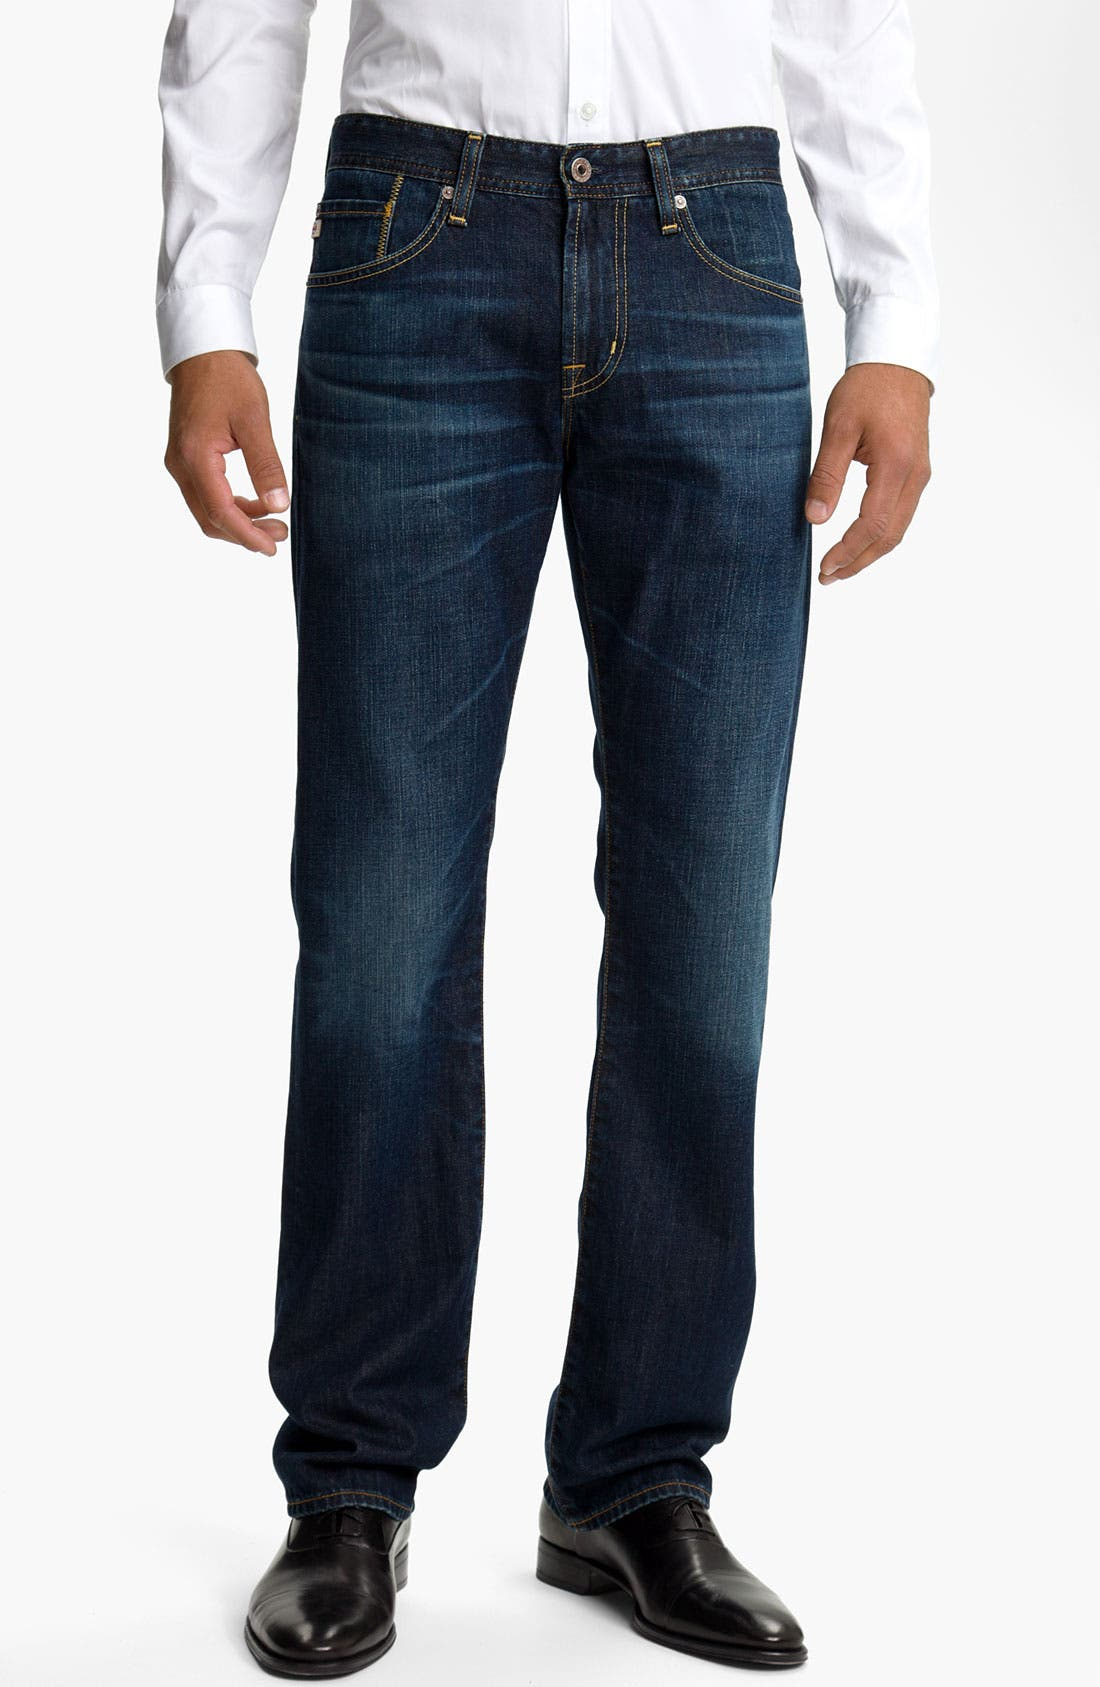 Main Image - AG Jeans 'Protégé' Straight Leg Jeans (Seven Year Smooth)